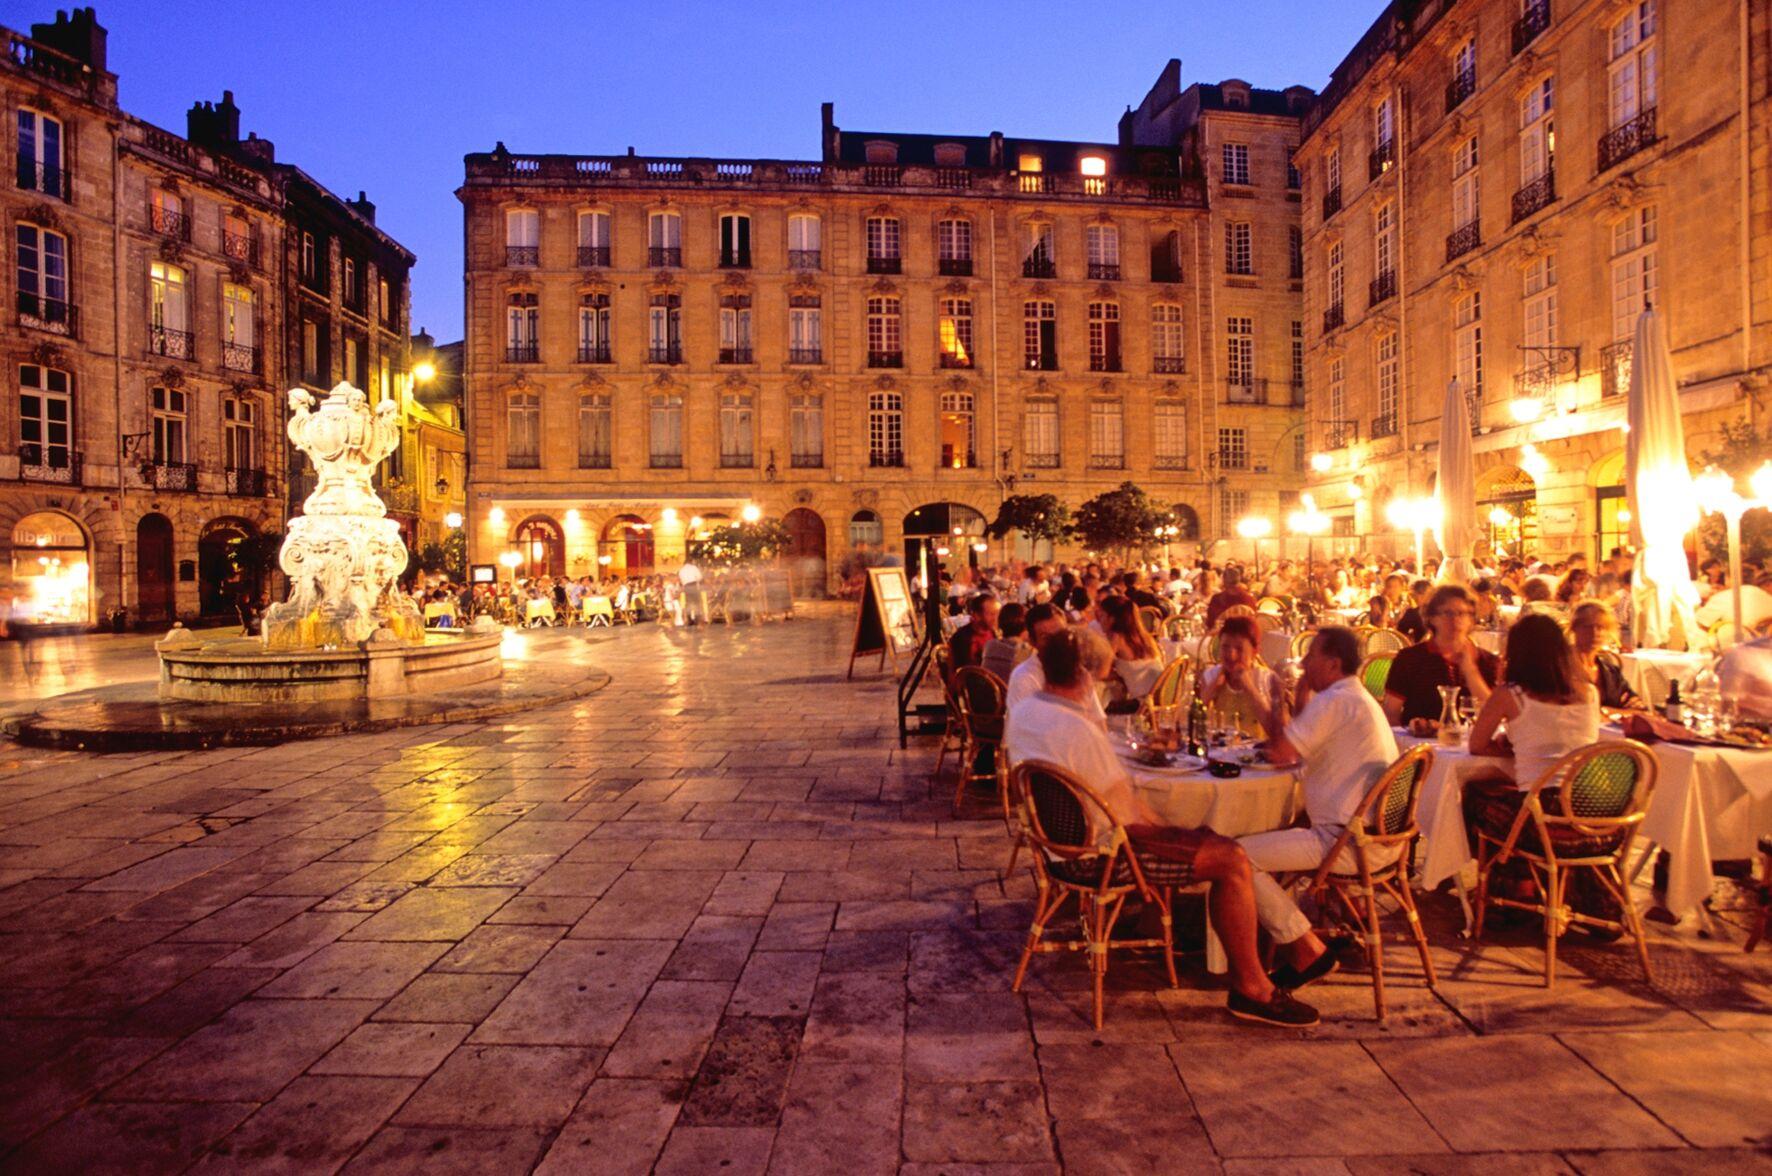 bordeaux-square-at-night